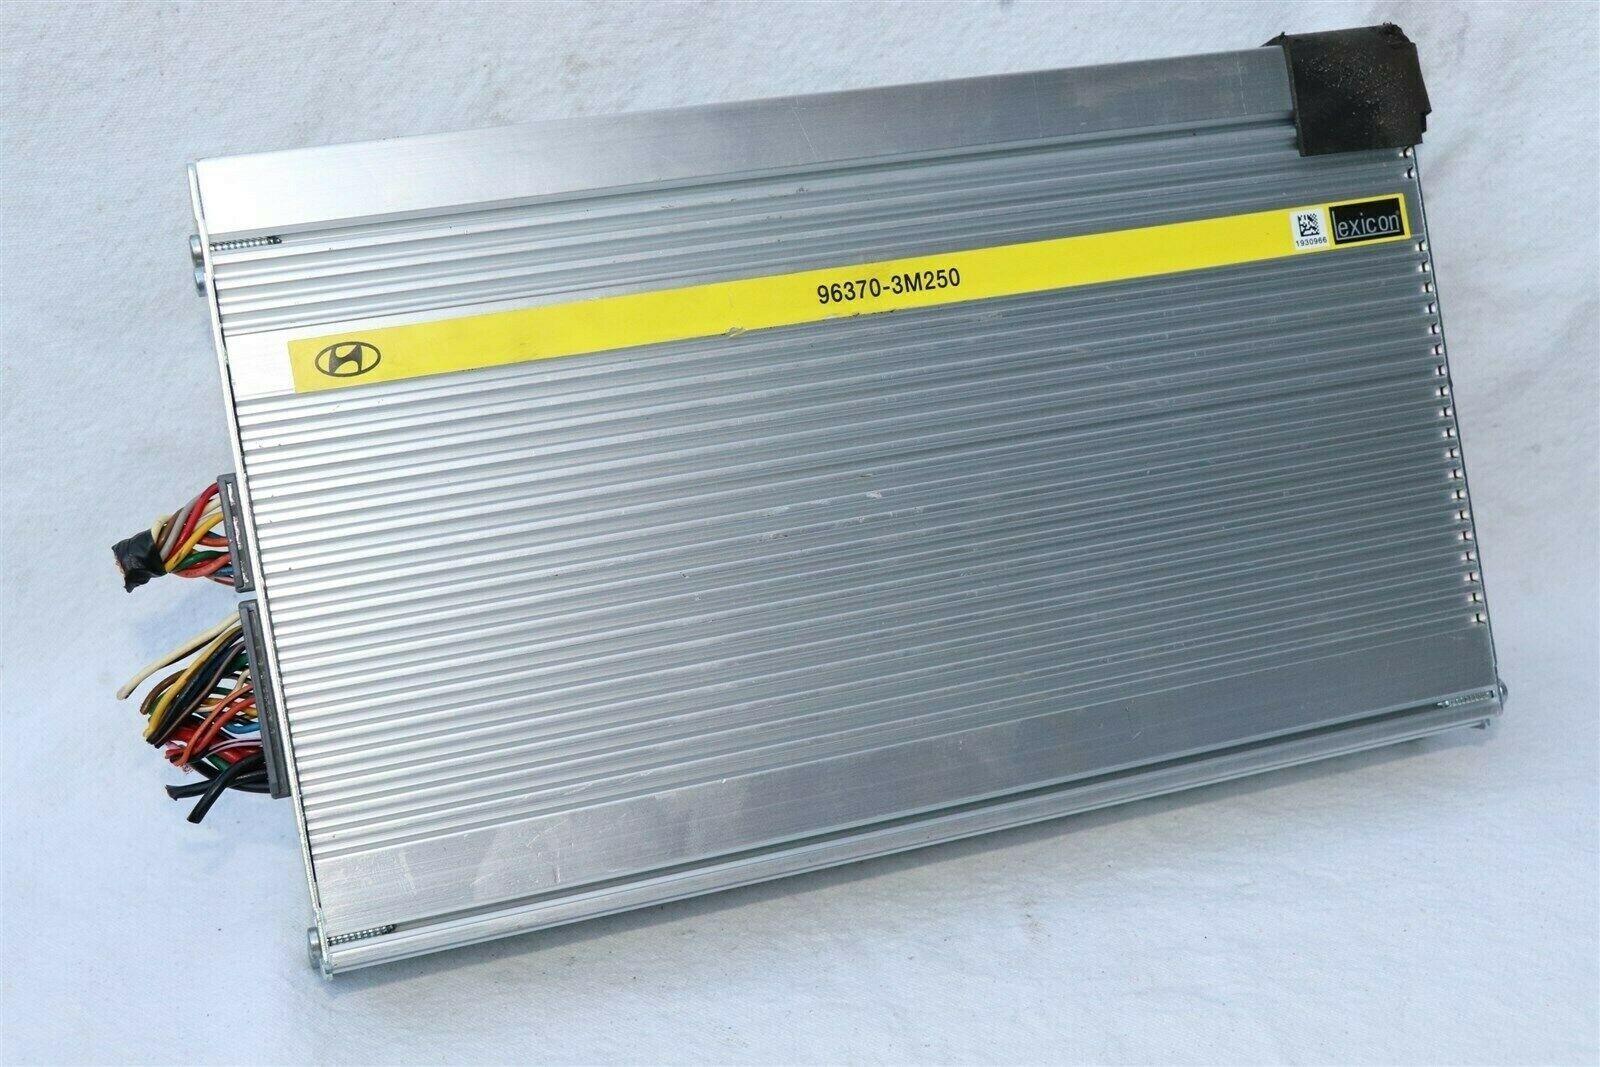 Hyundai Genisis Lexicon Radio Audio Amp Amplifier 96370-3M250